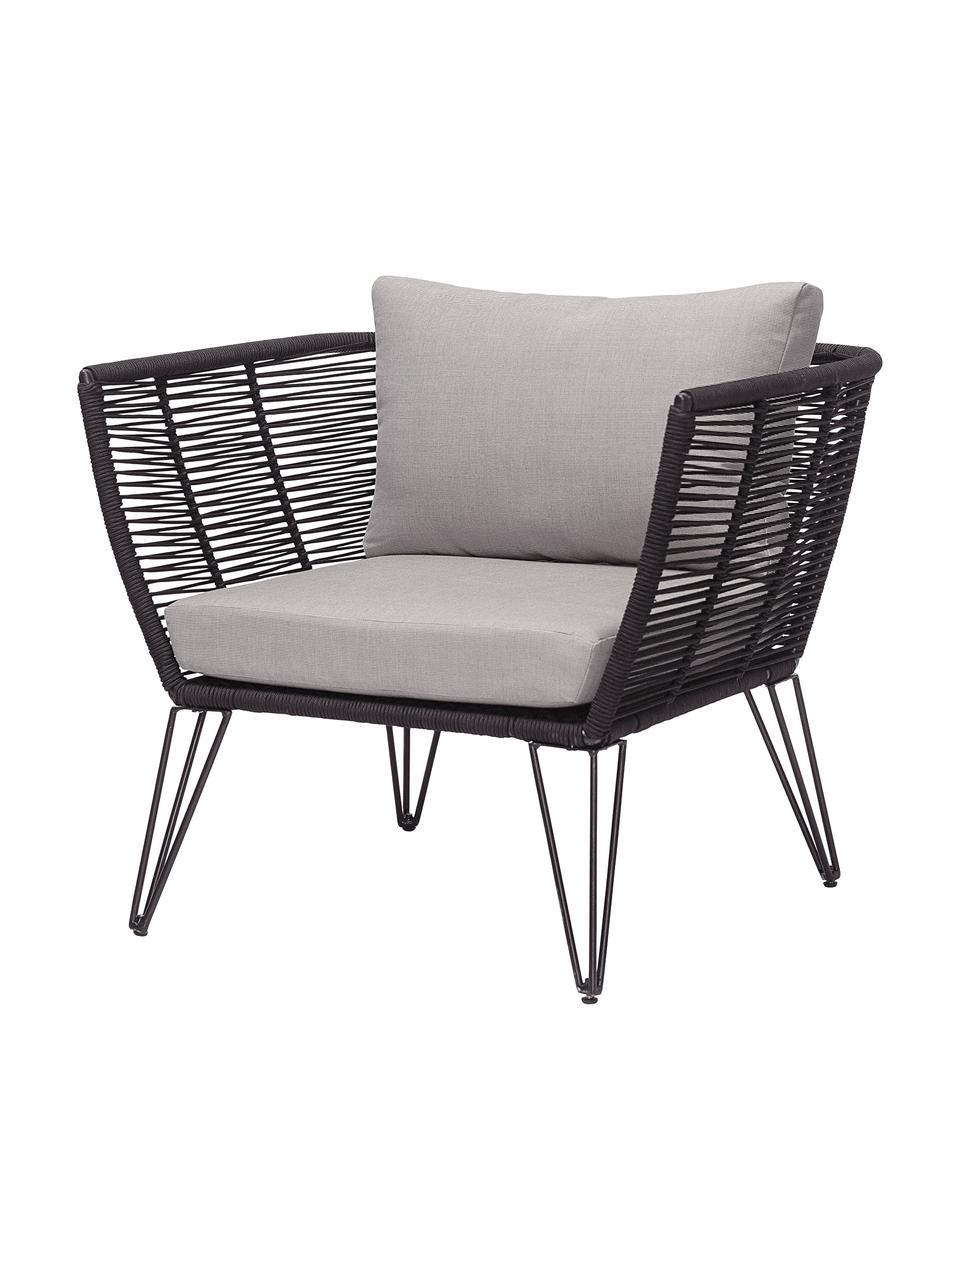 Garten-Loungesessel Mundo mit Kunststoff-Geflecht, Gestell: Metall, pulverbeschichtet, Sitzfläche: Polyethylen, Bezug: Polyester, Schwarz, matt, Beige, B 87 x T 74 cm